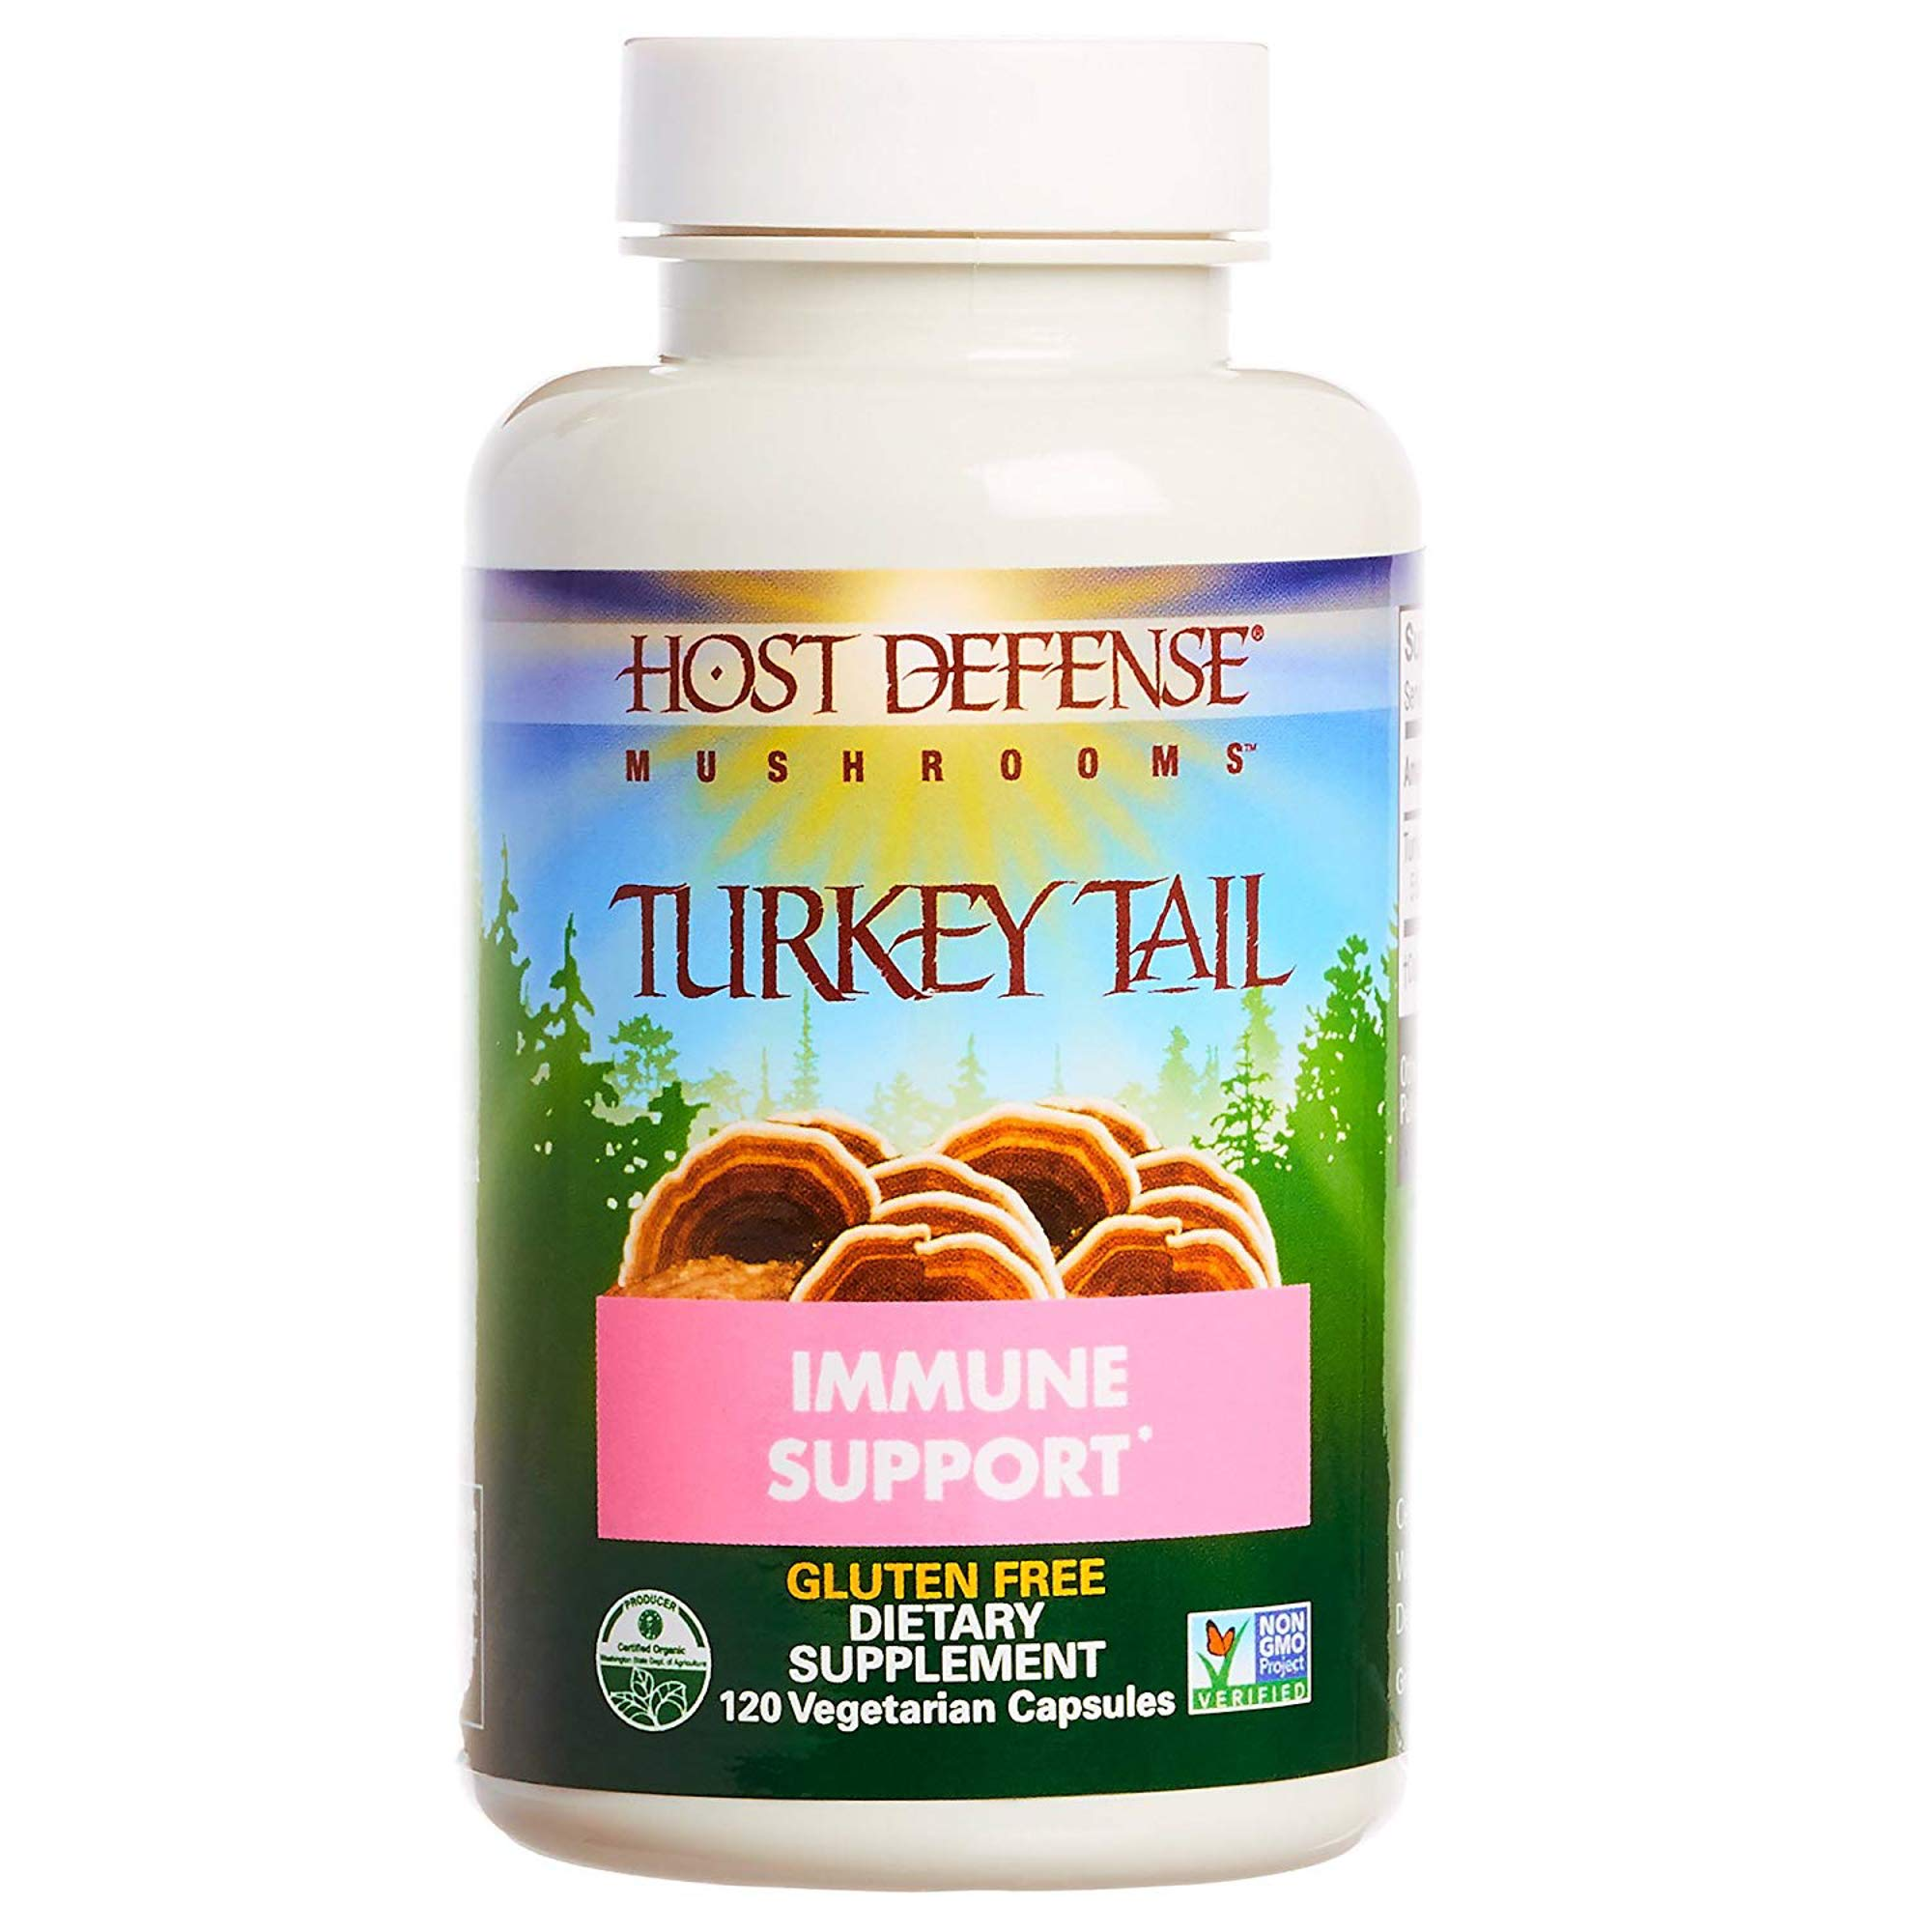 Host Defense - Turkey Tail Mushroom Capsules, Naturally Supports Immune Response, Non-GMO, Vegan, Organic, 120 Count